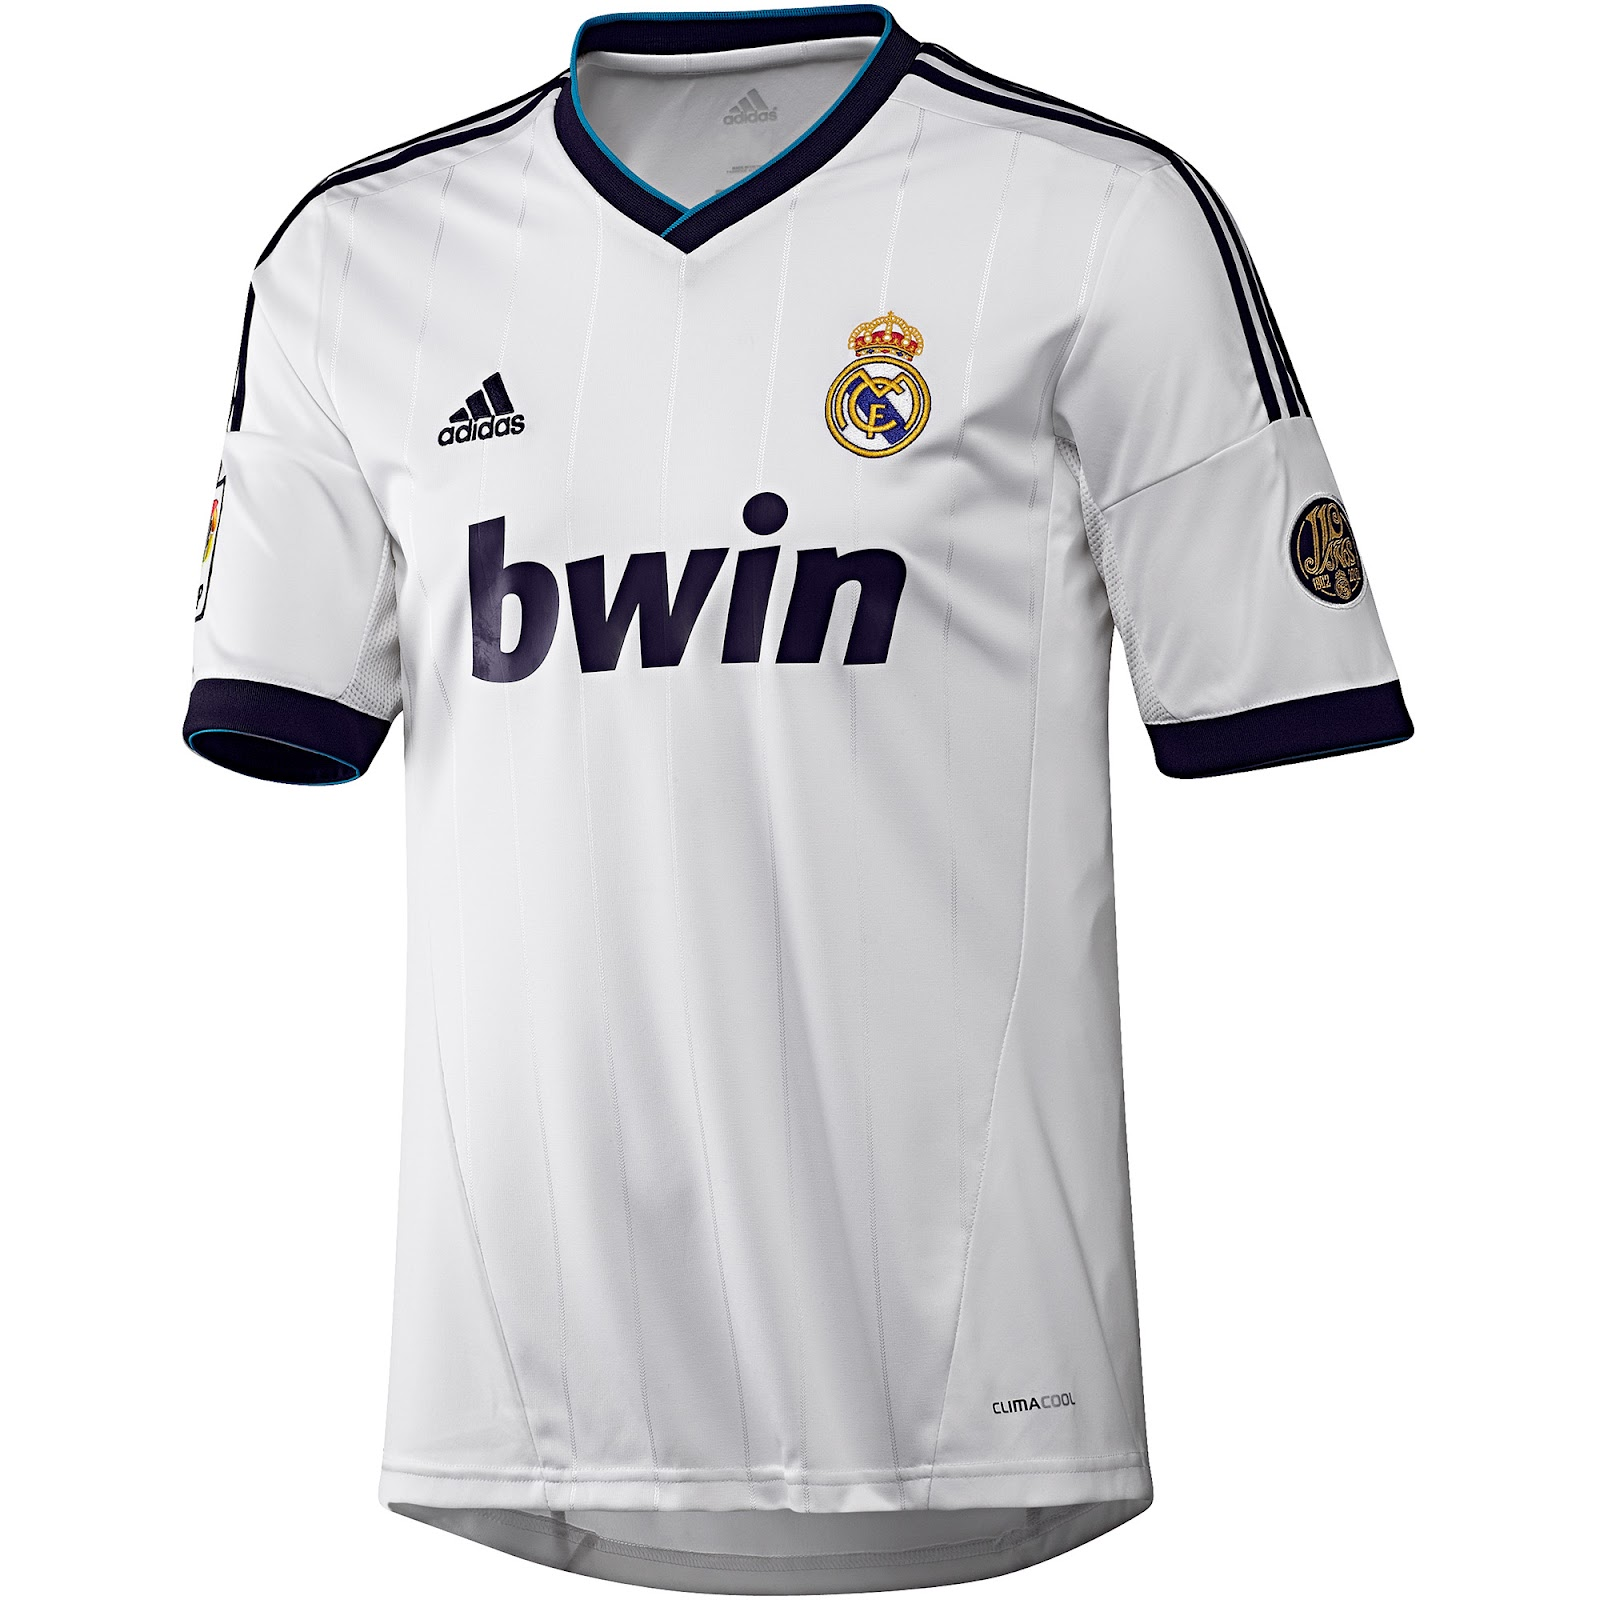 Camiseta Real Madrid 2012-2013 CONFIRMADA - Home & Away Kit Real Madrid 2013